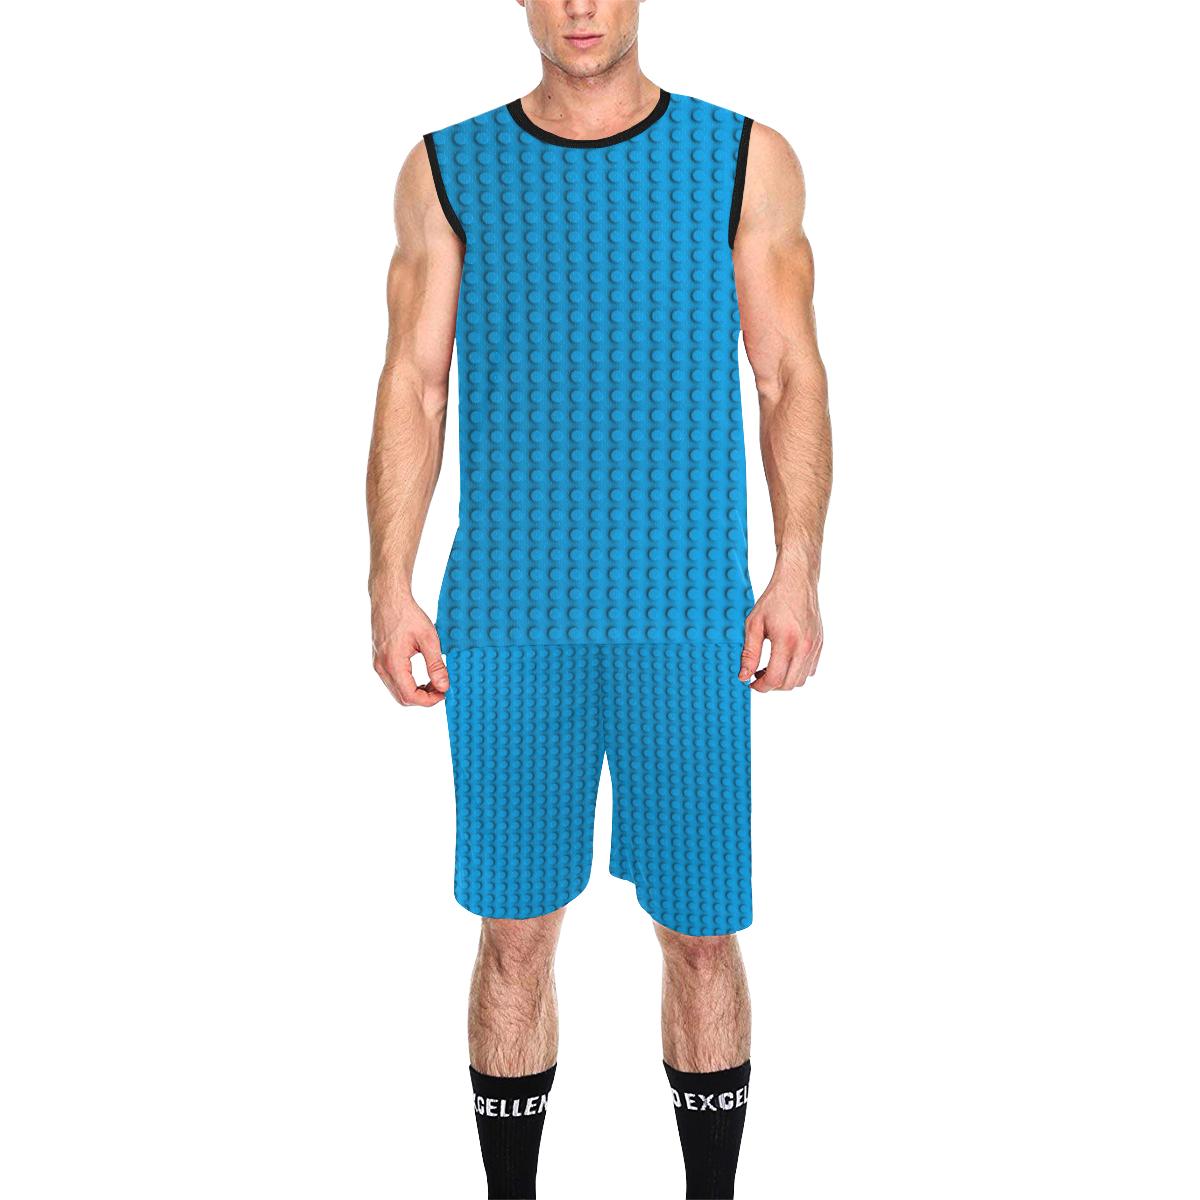 PLASTIC All Over Print Basketball Uniform